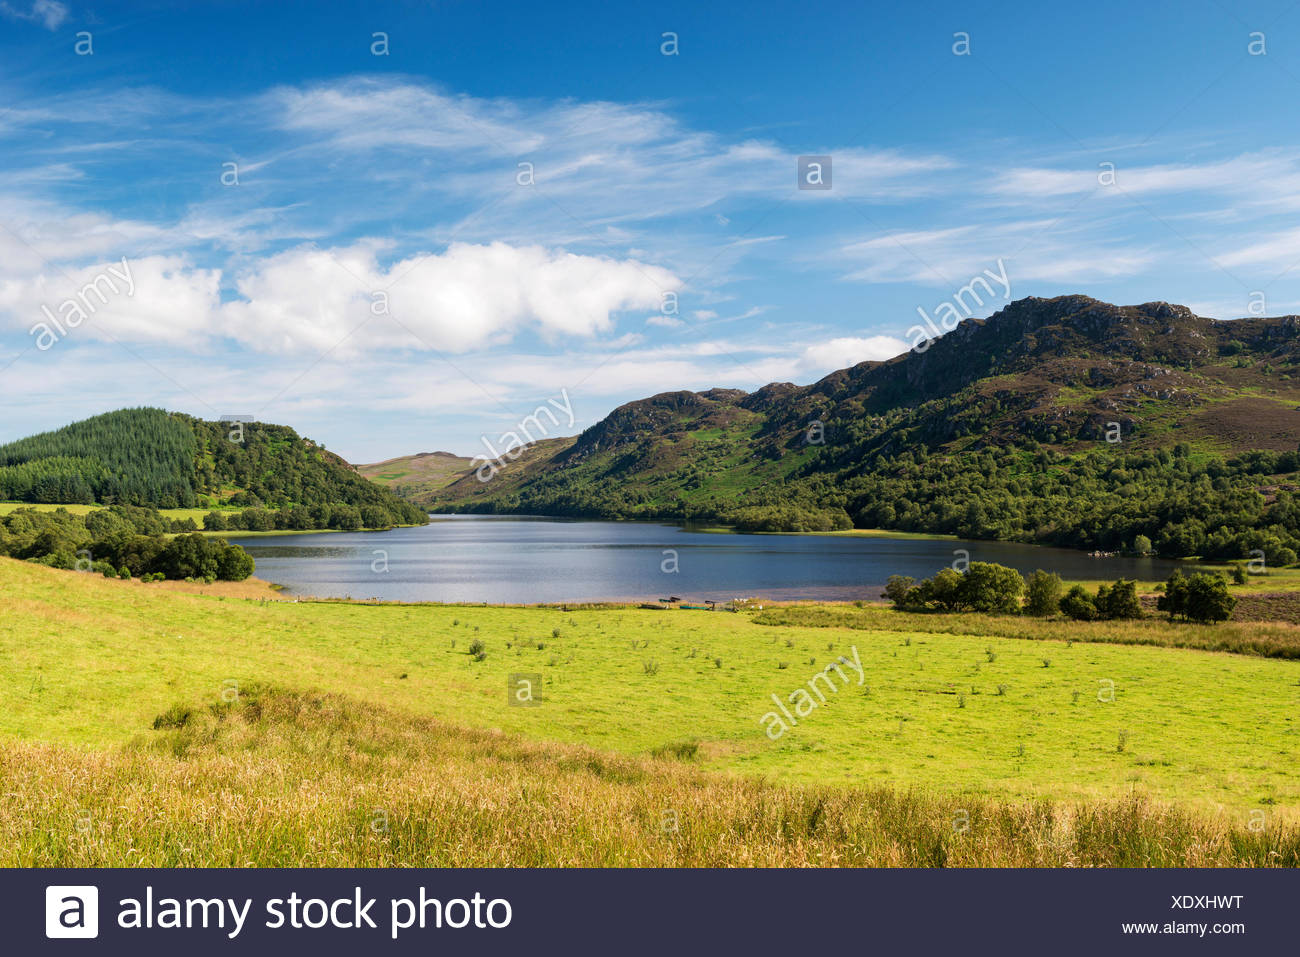 Loch Ruthven near Torness, North West Highlands, Scotland, United Kingdom, Europe - Stock Image